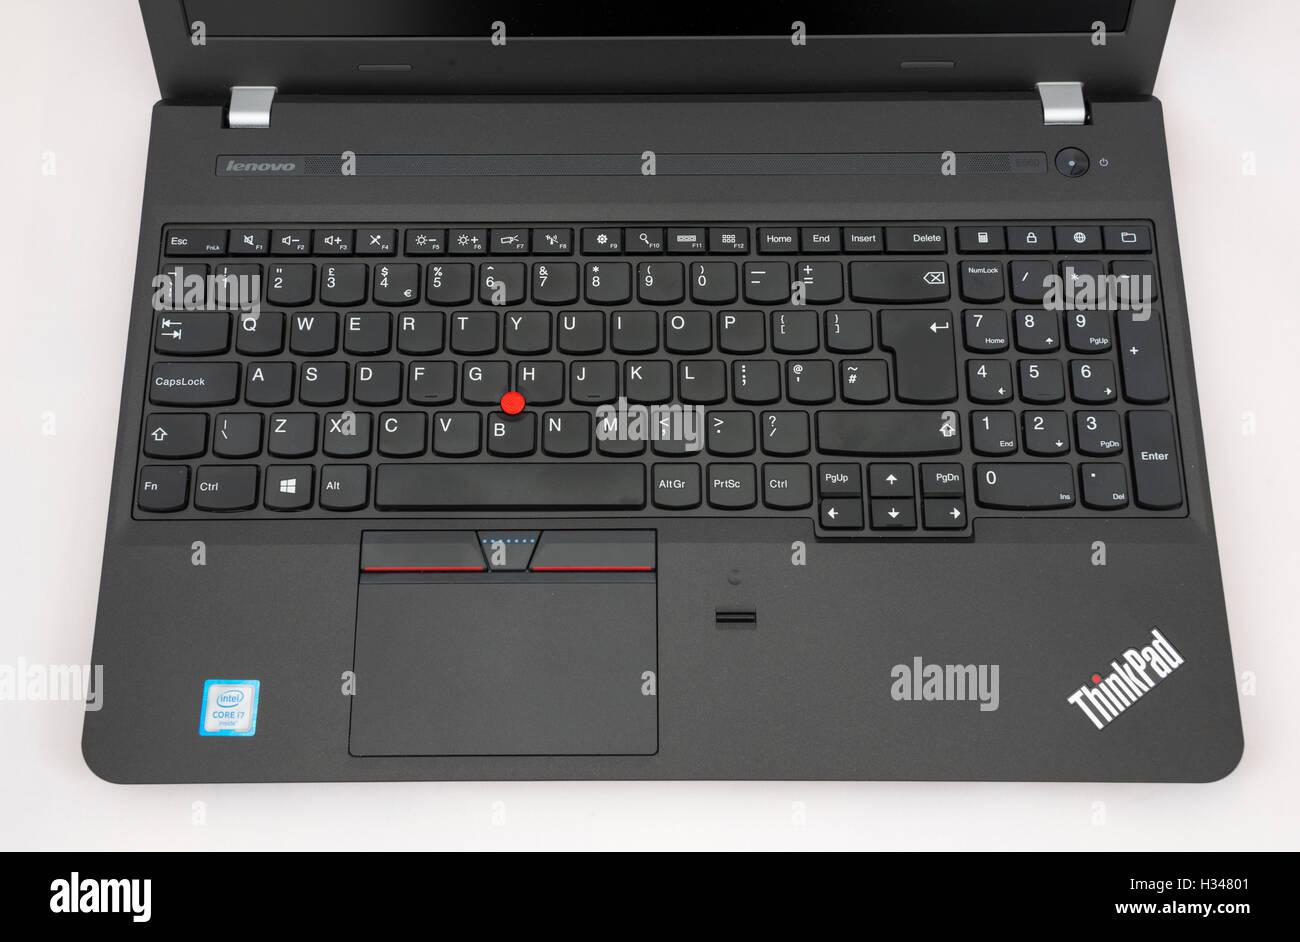 Keyboard for a Lenovo E560 Thinkpad laptop. - Stock Image